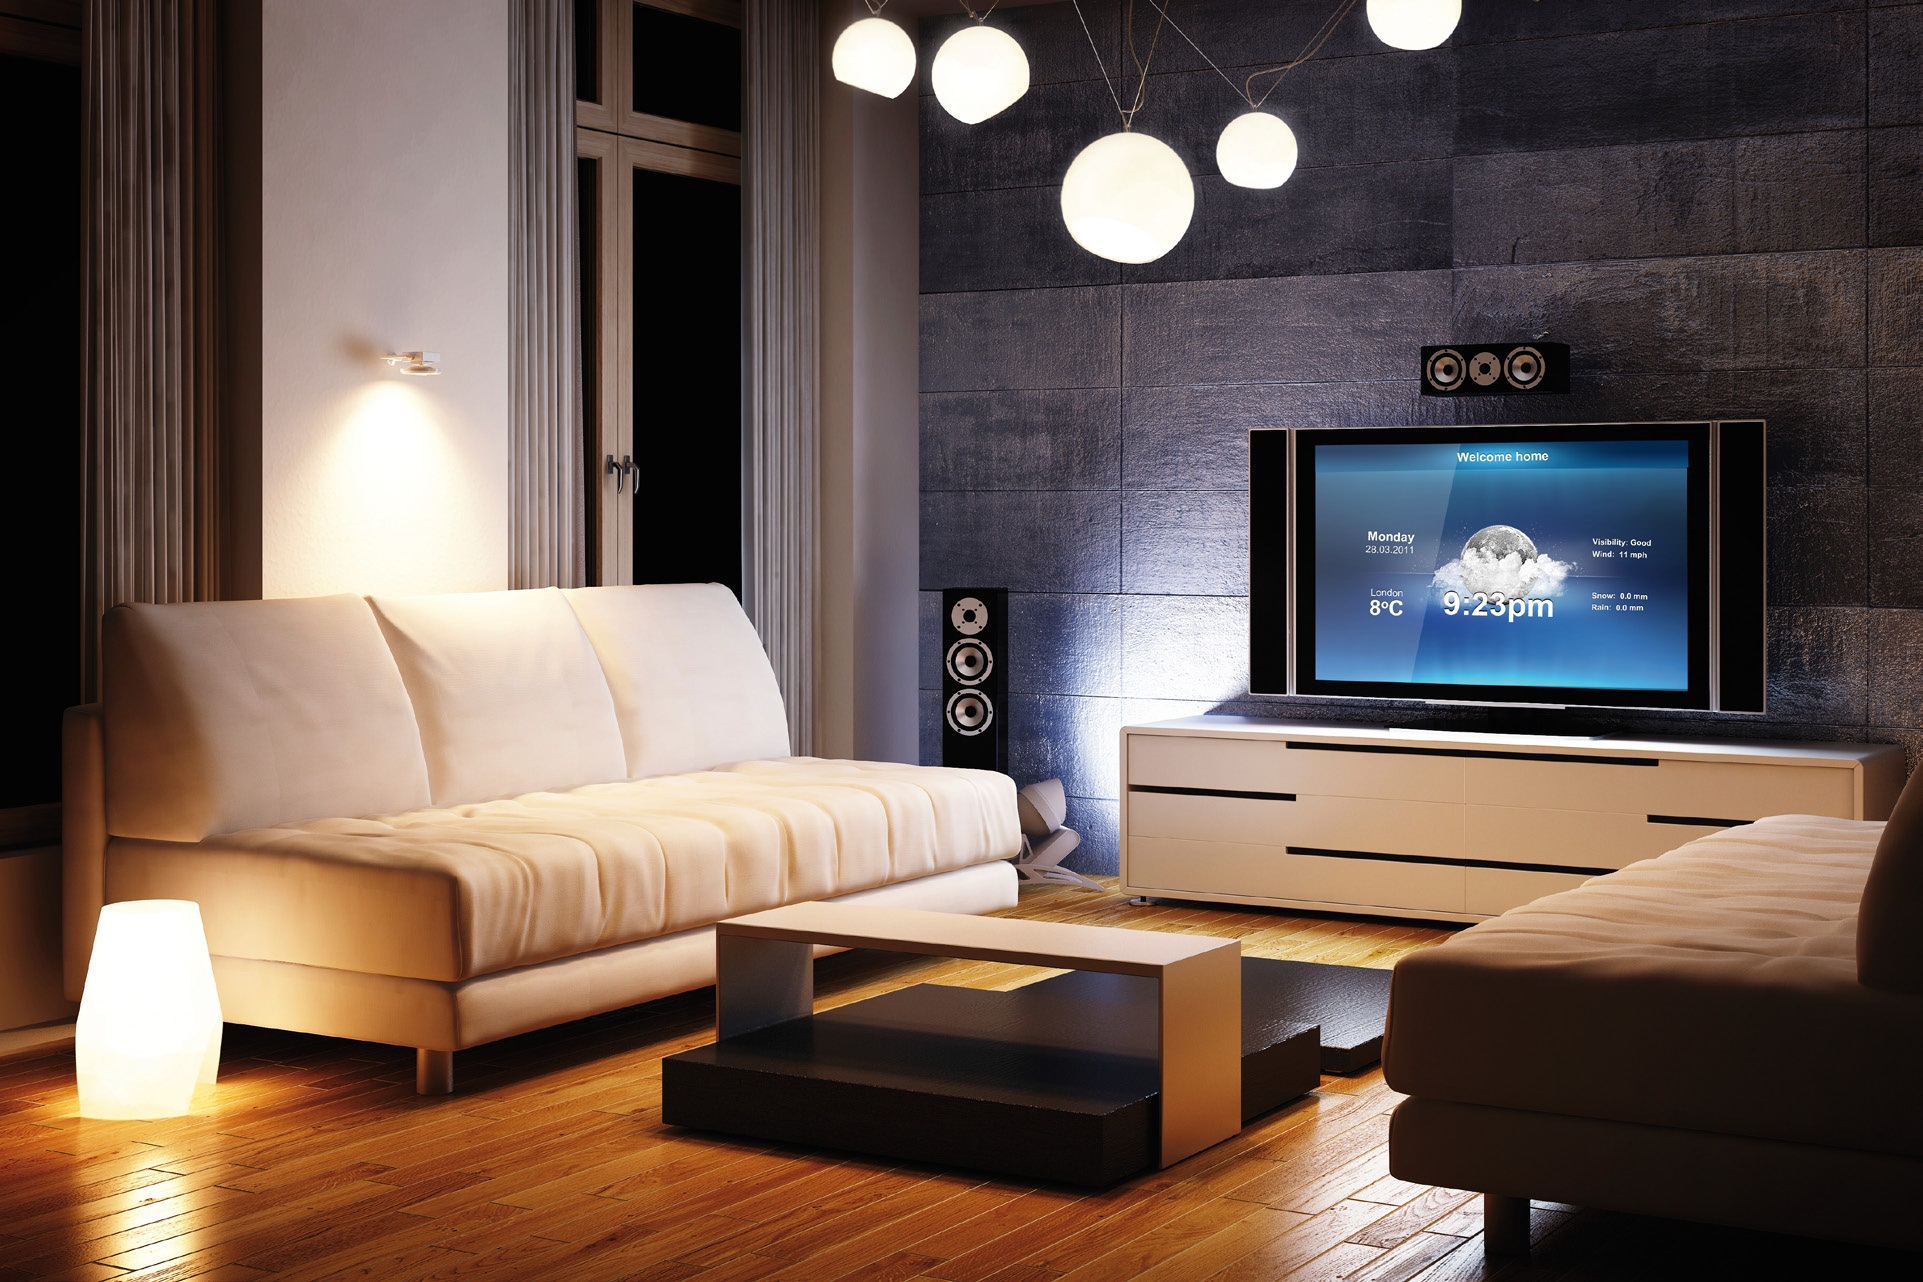 FIBARO Home Automation System